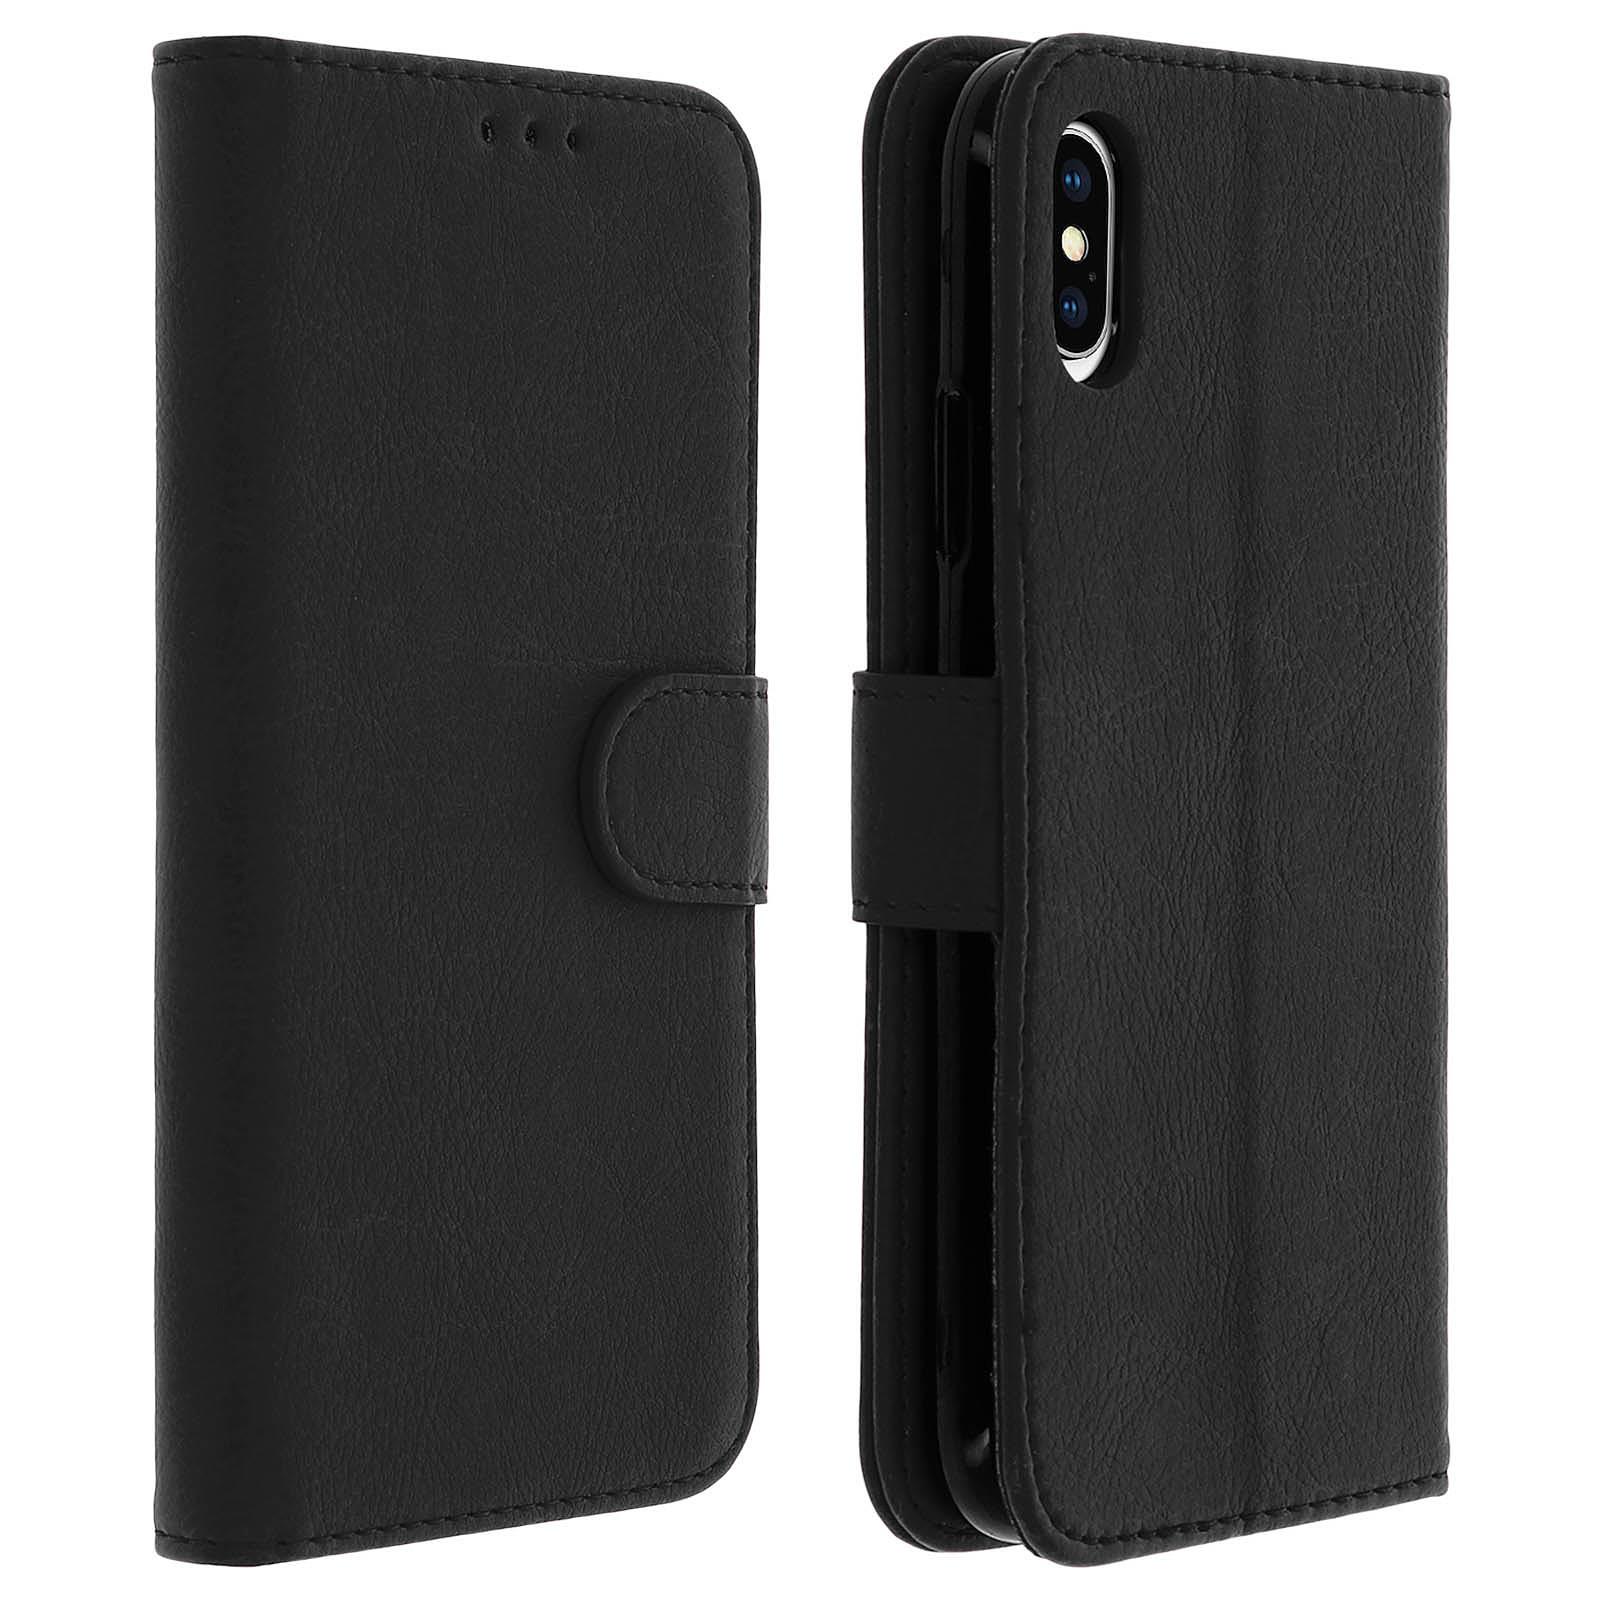 Avizar Etui folio Noir Portefeuille pour Apple iPhone XS Max